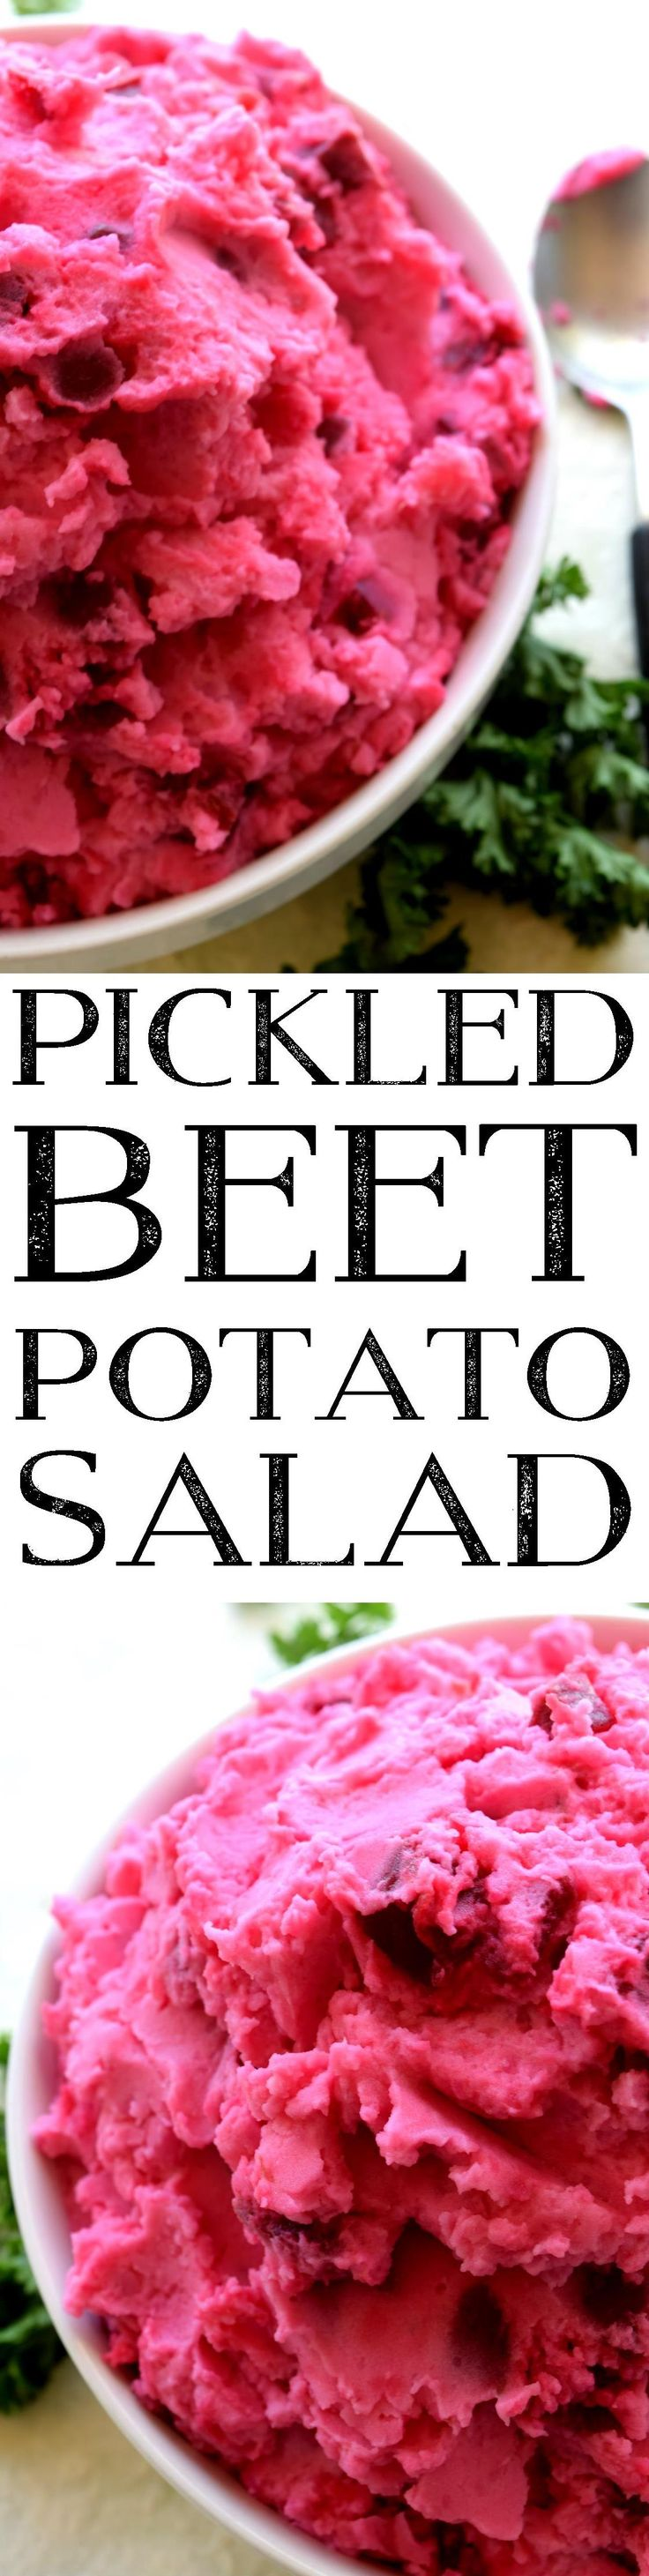 Pickled Beet Potato Salad (1)